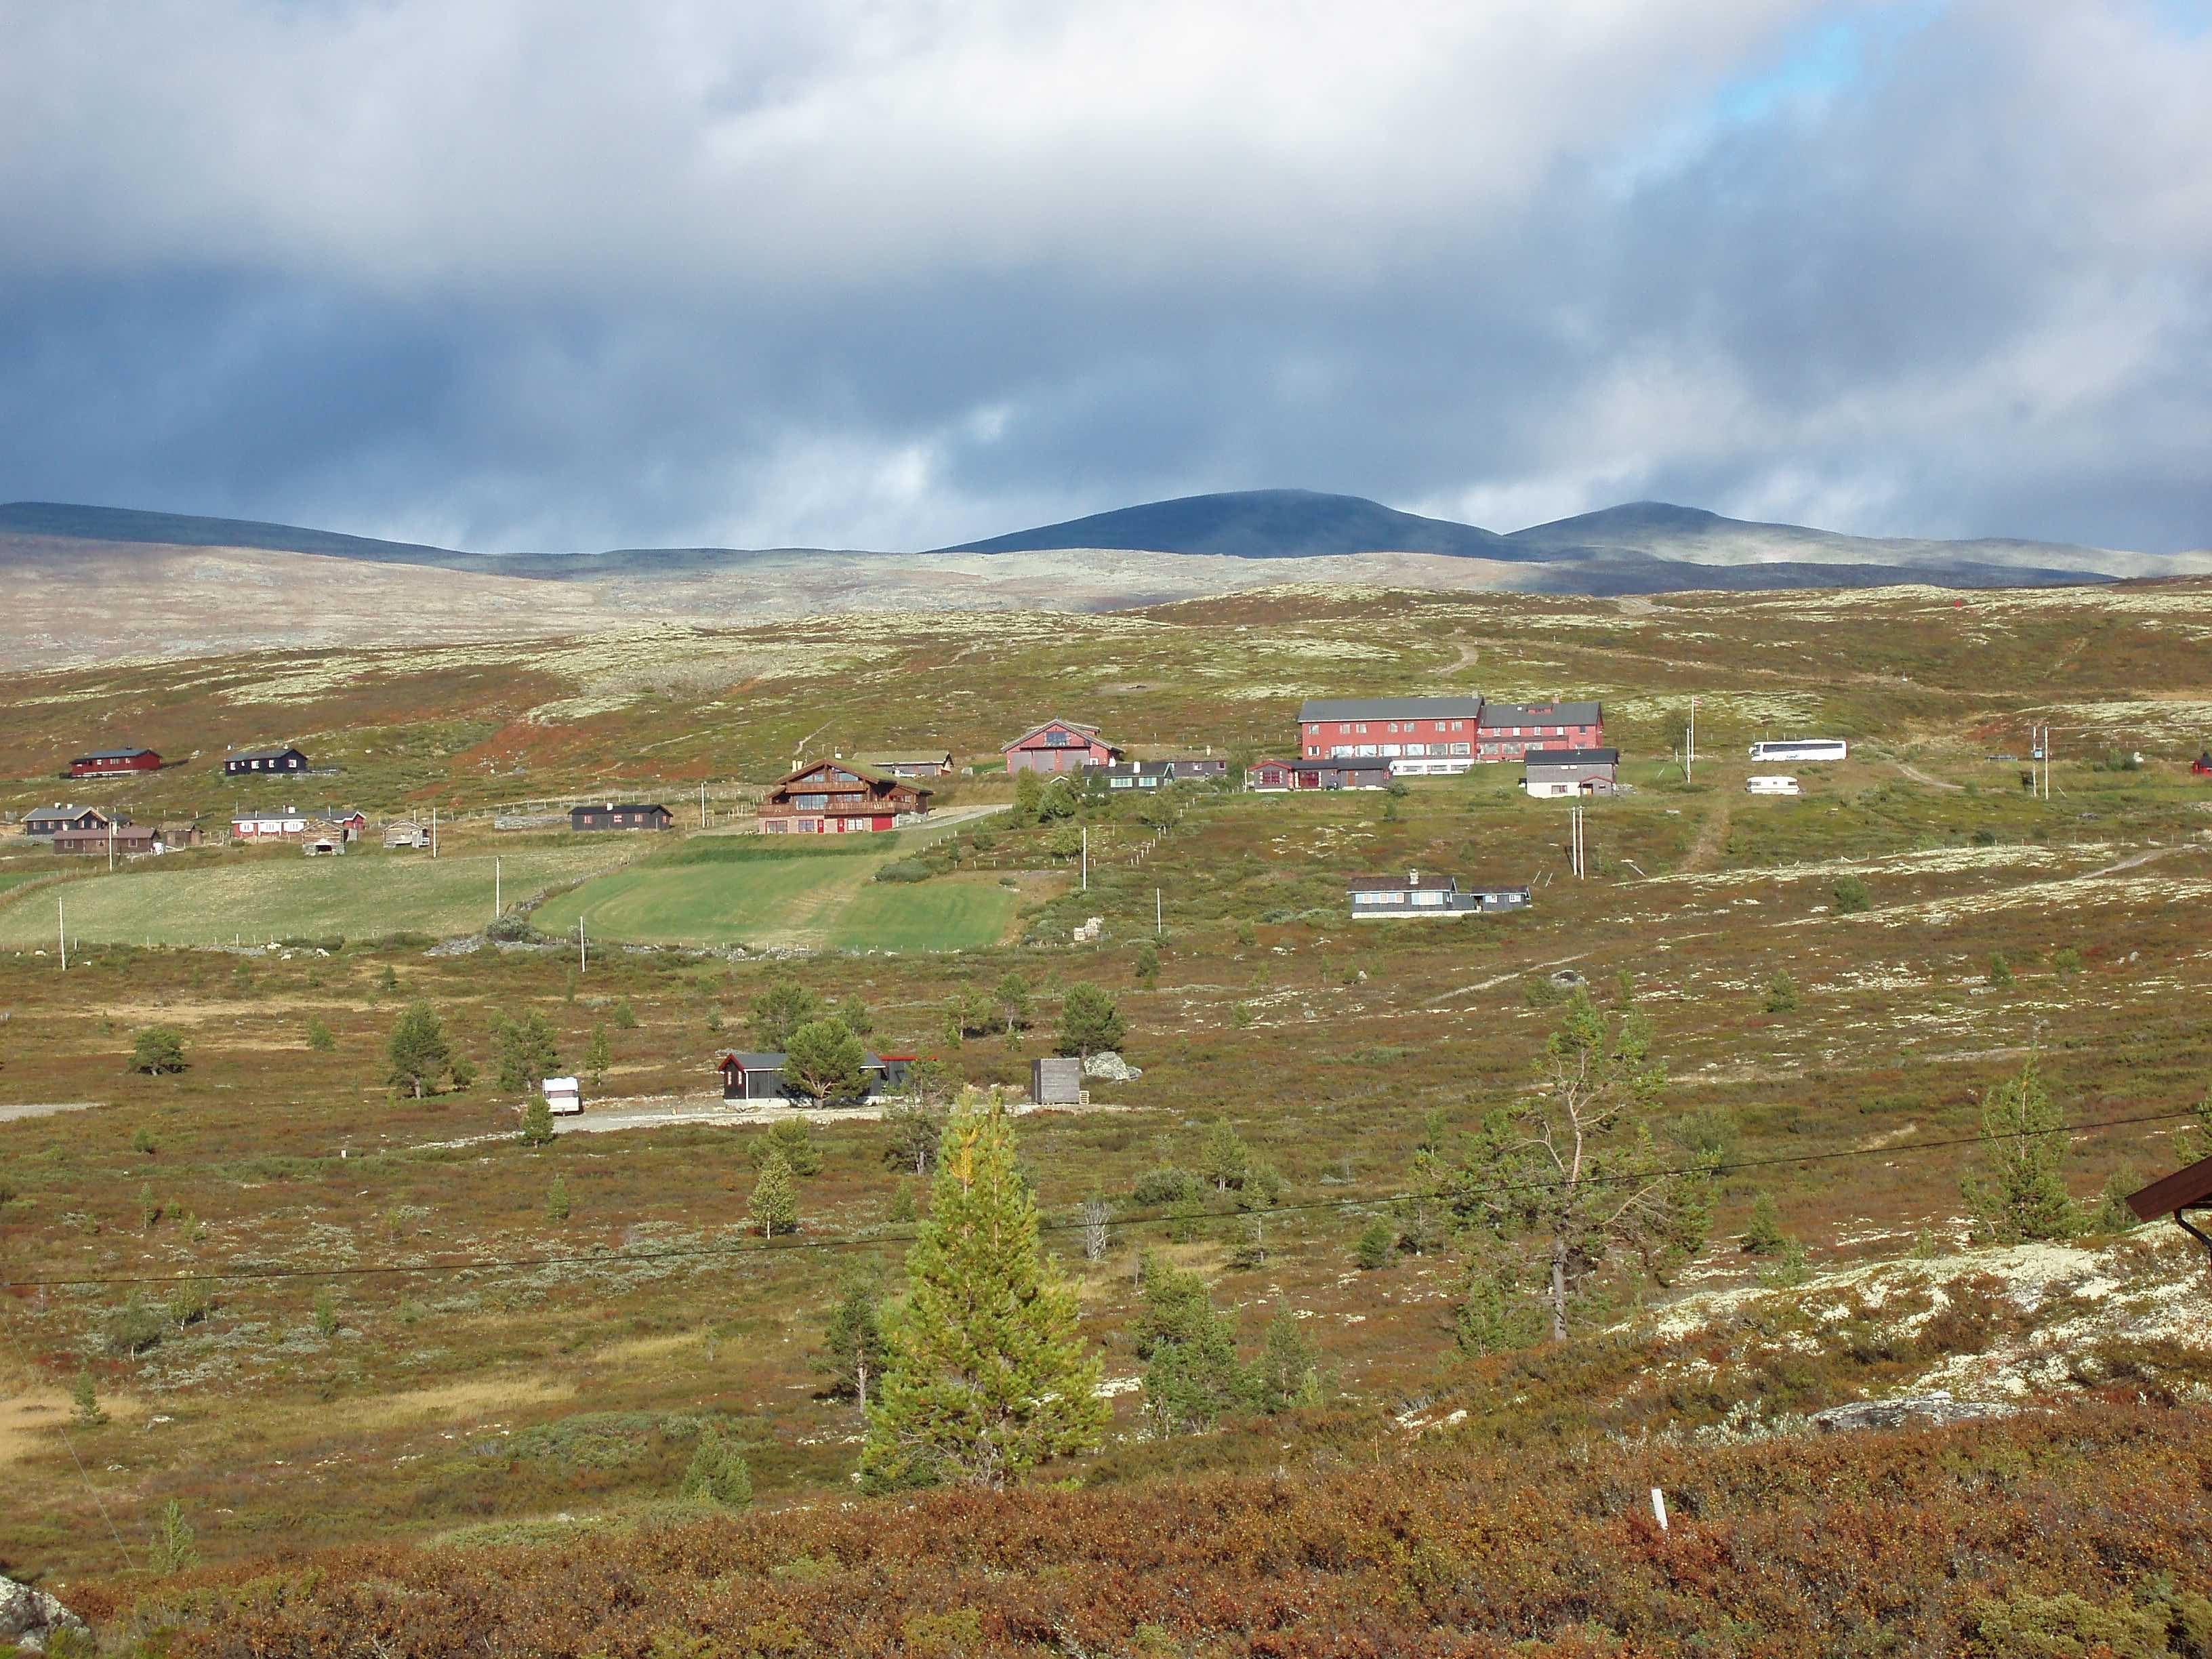 Rondane Haukliseter Fjellhotell (copy)